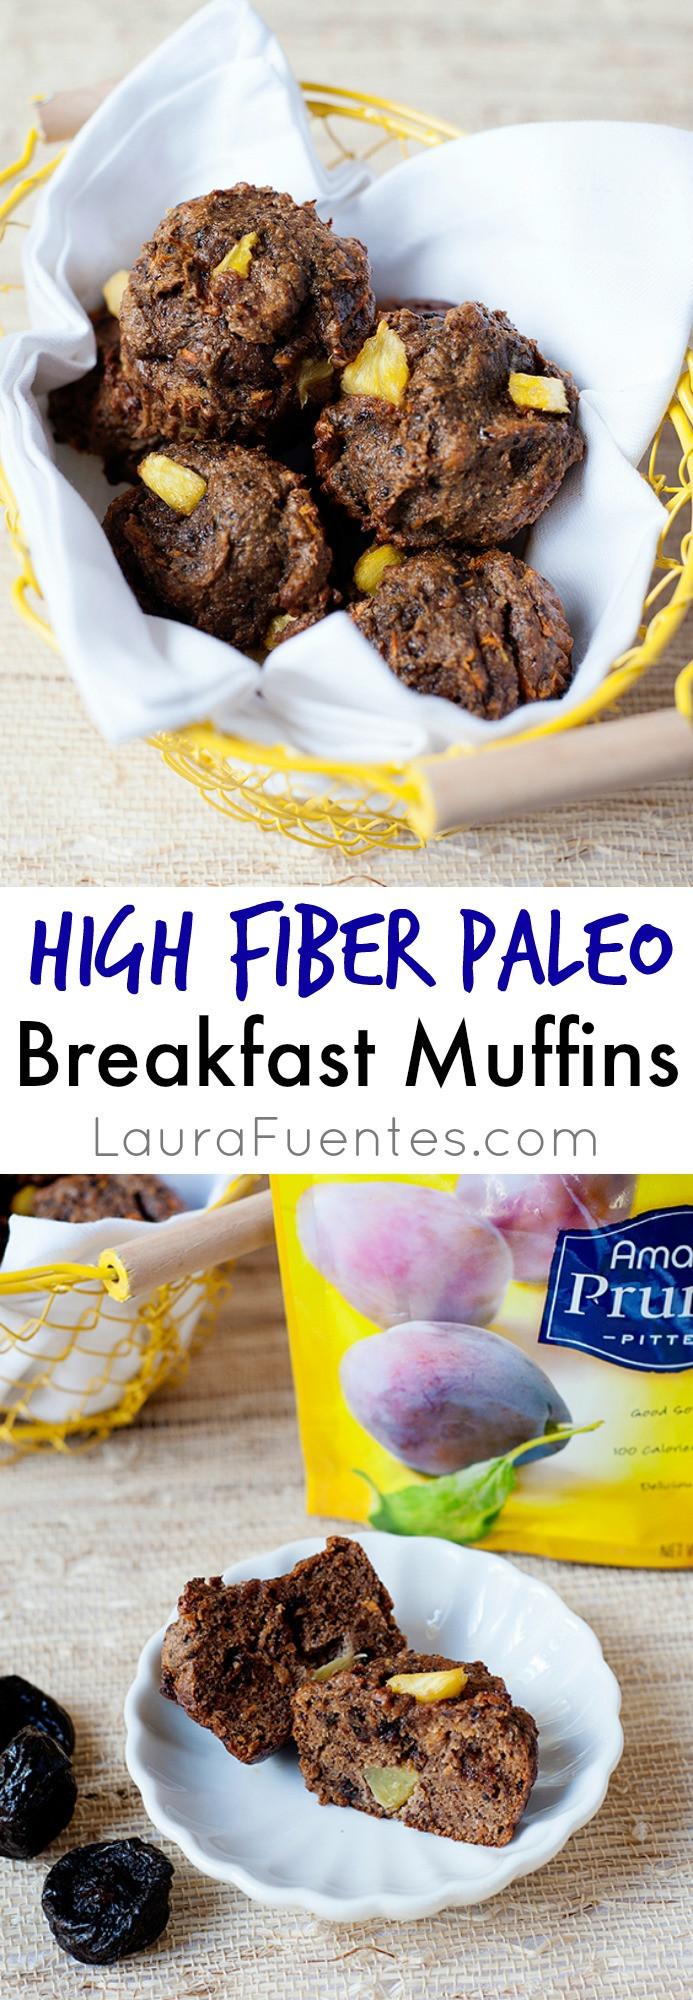 High Fiber Breakfast Recipe  High Fiber Paleo Breakfast Muffins